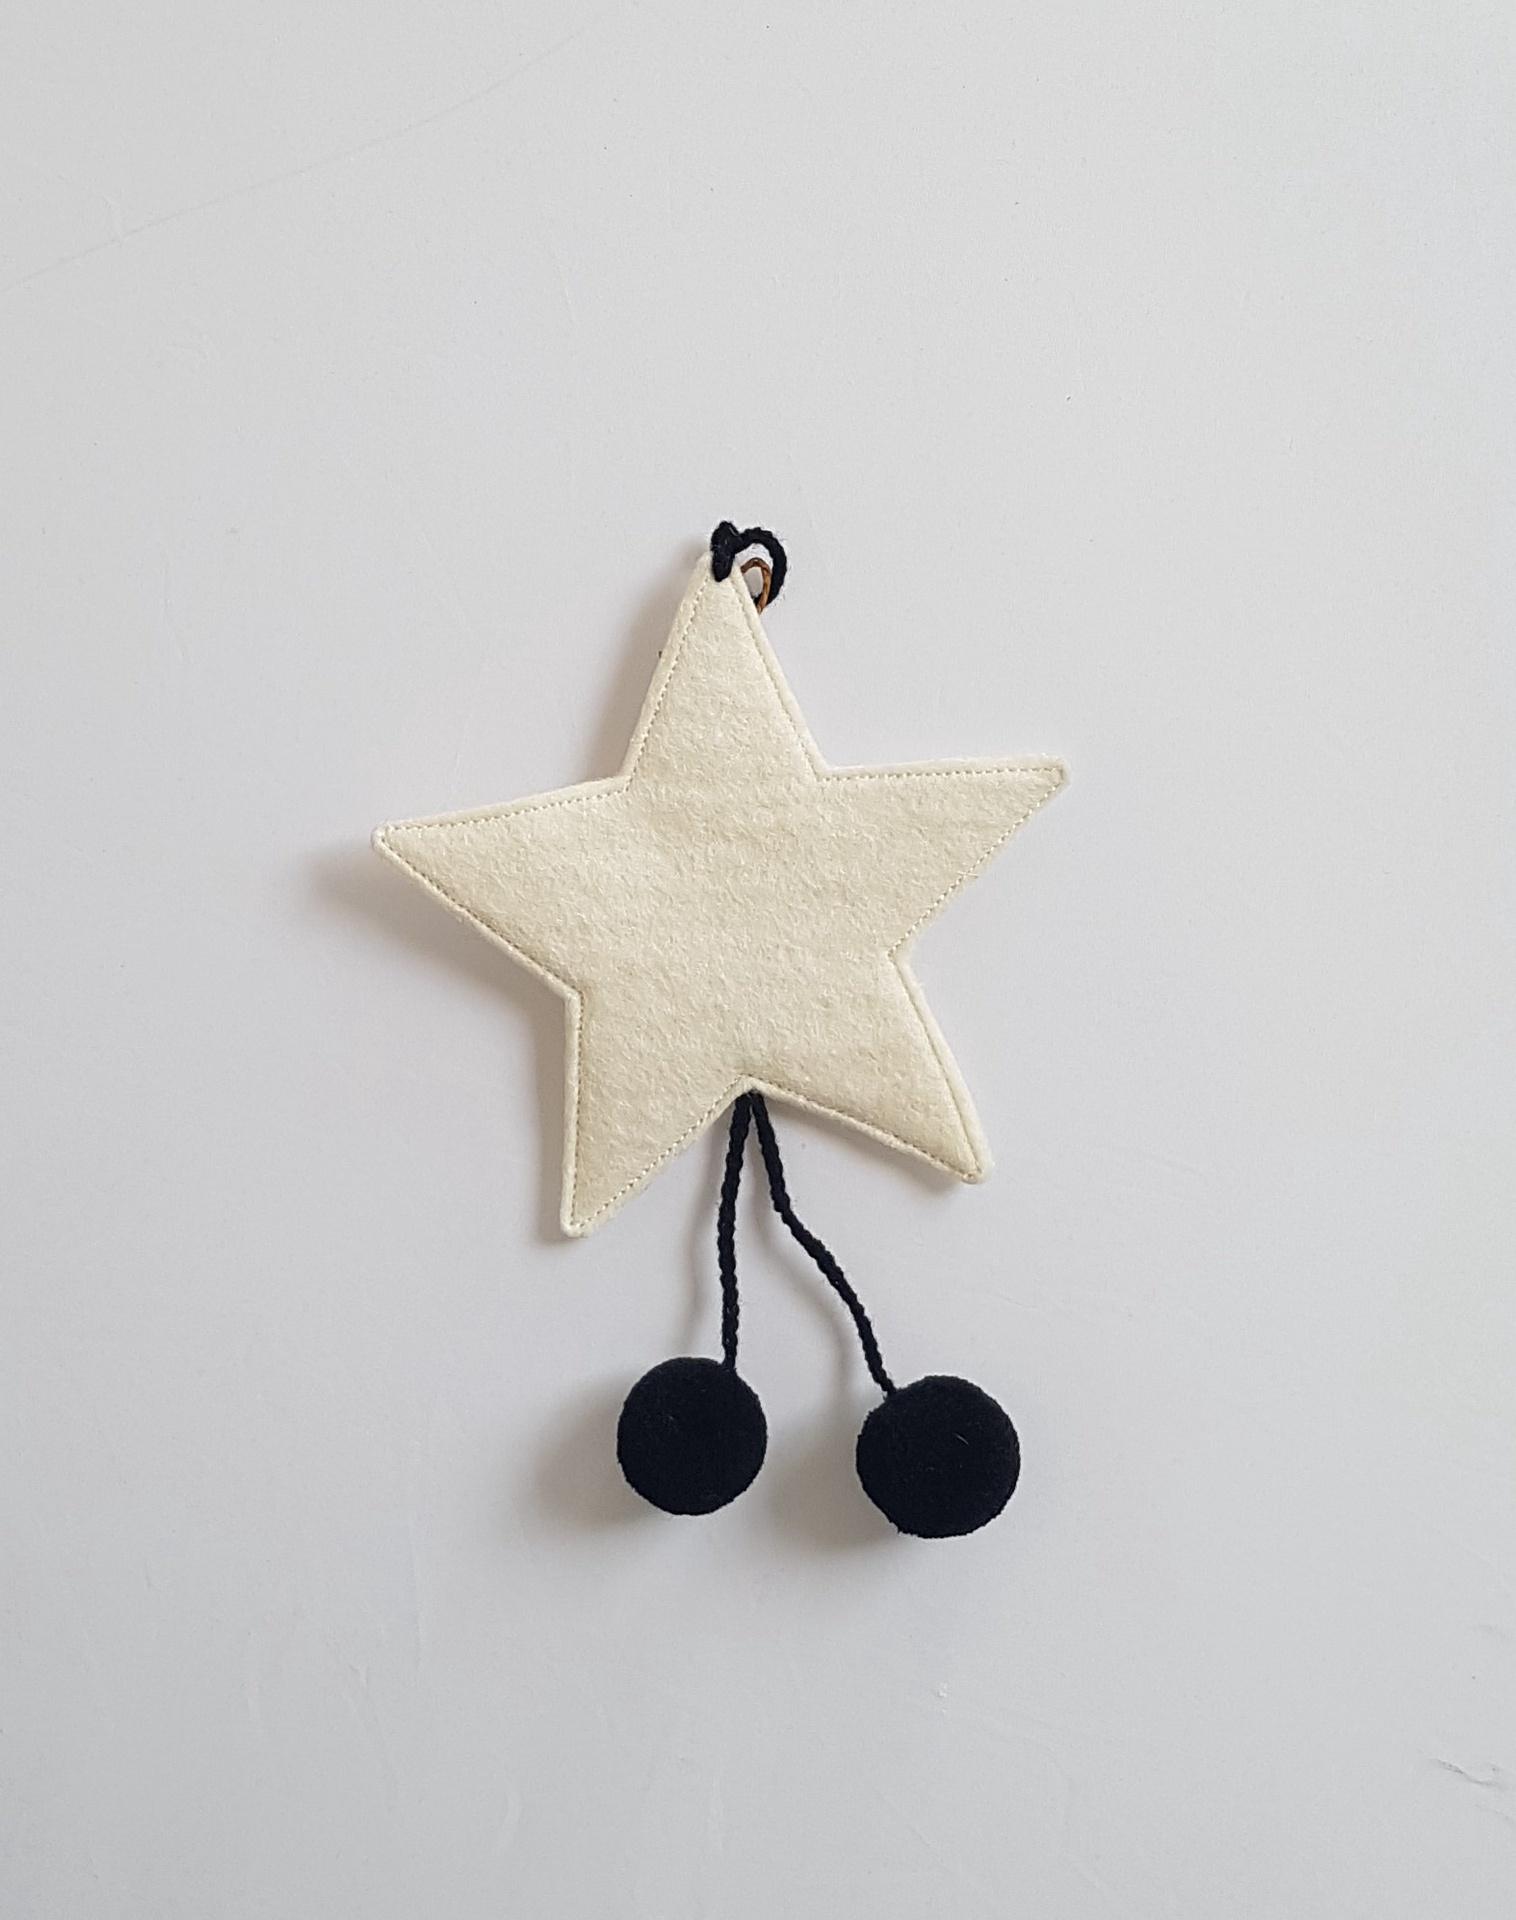 FELT STARS WITH POM POMS -NATURAL/BLACK